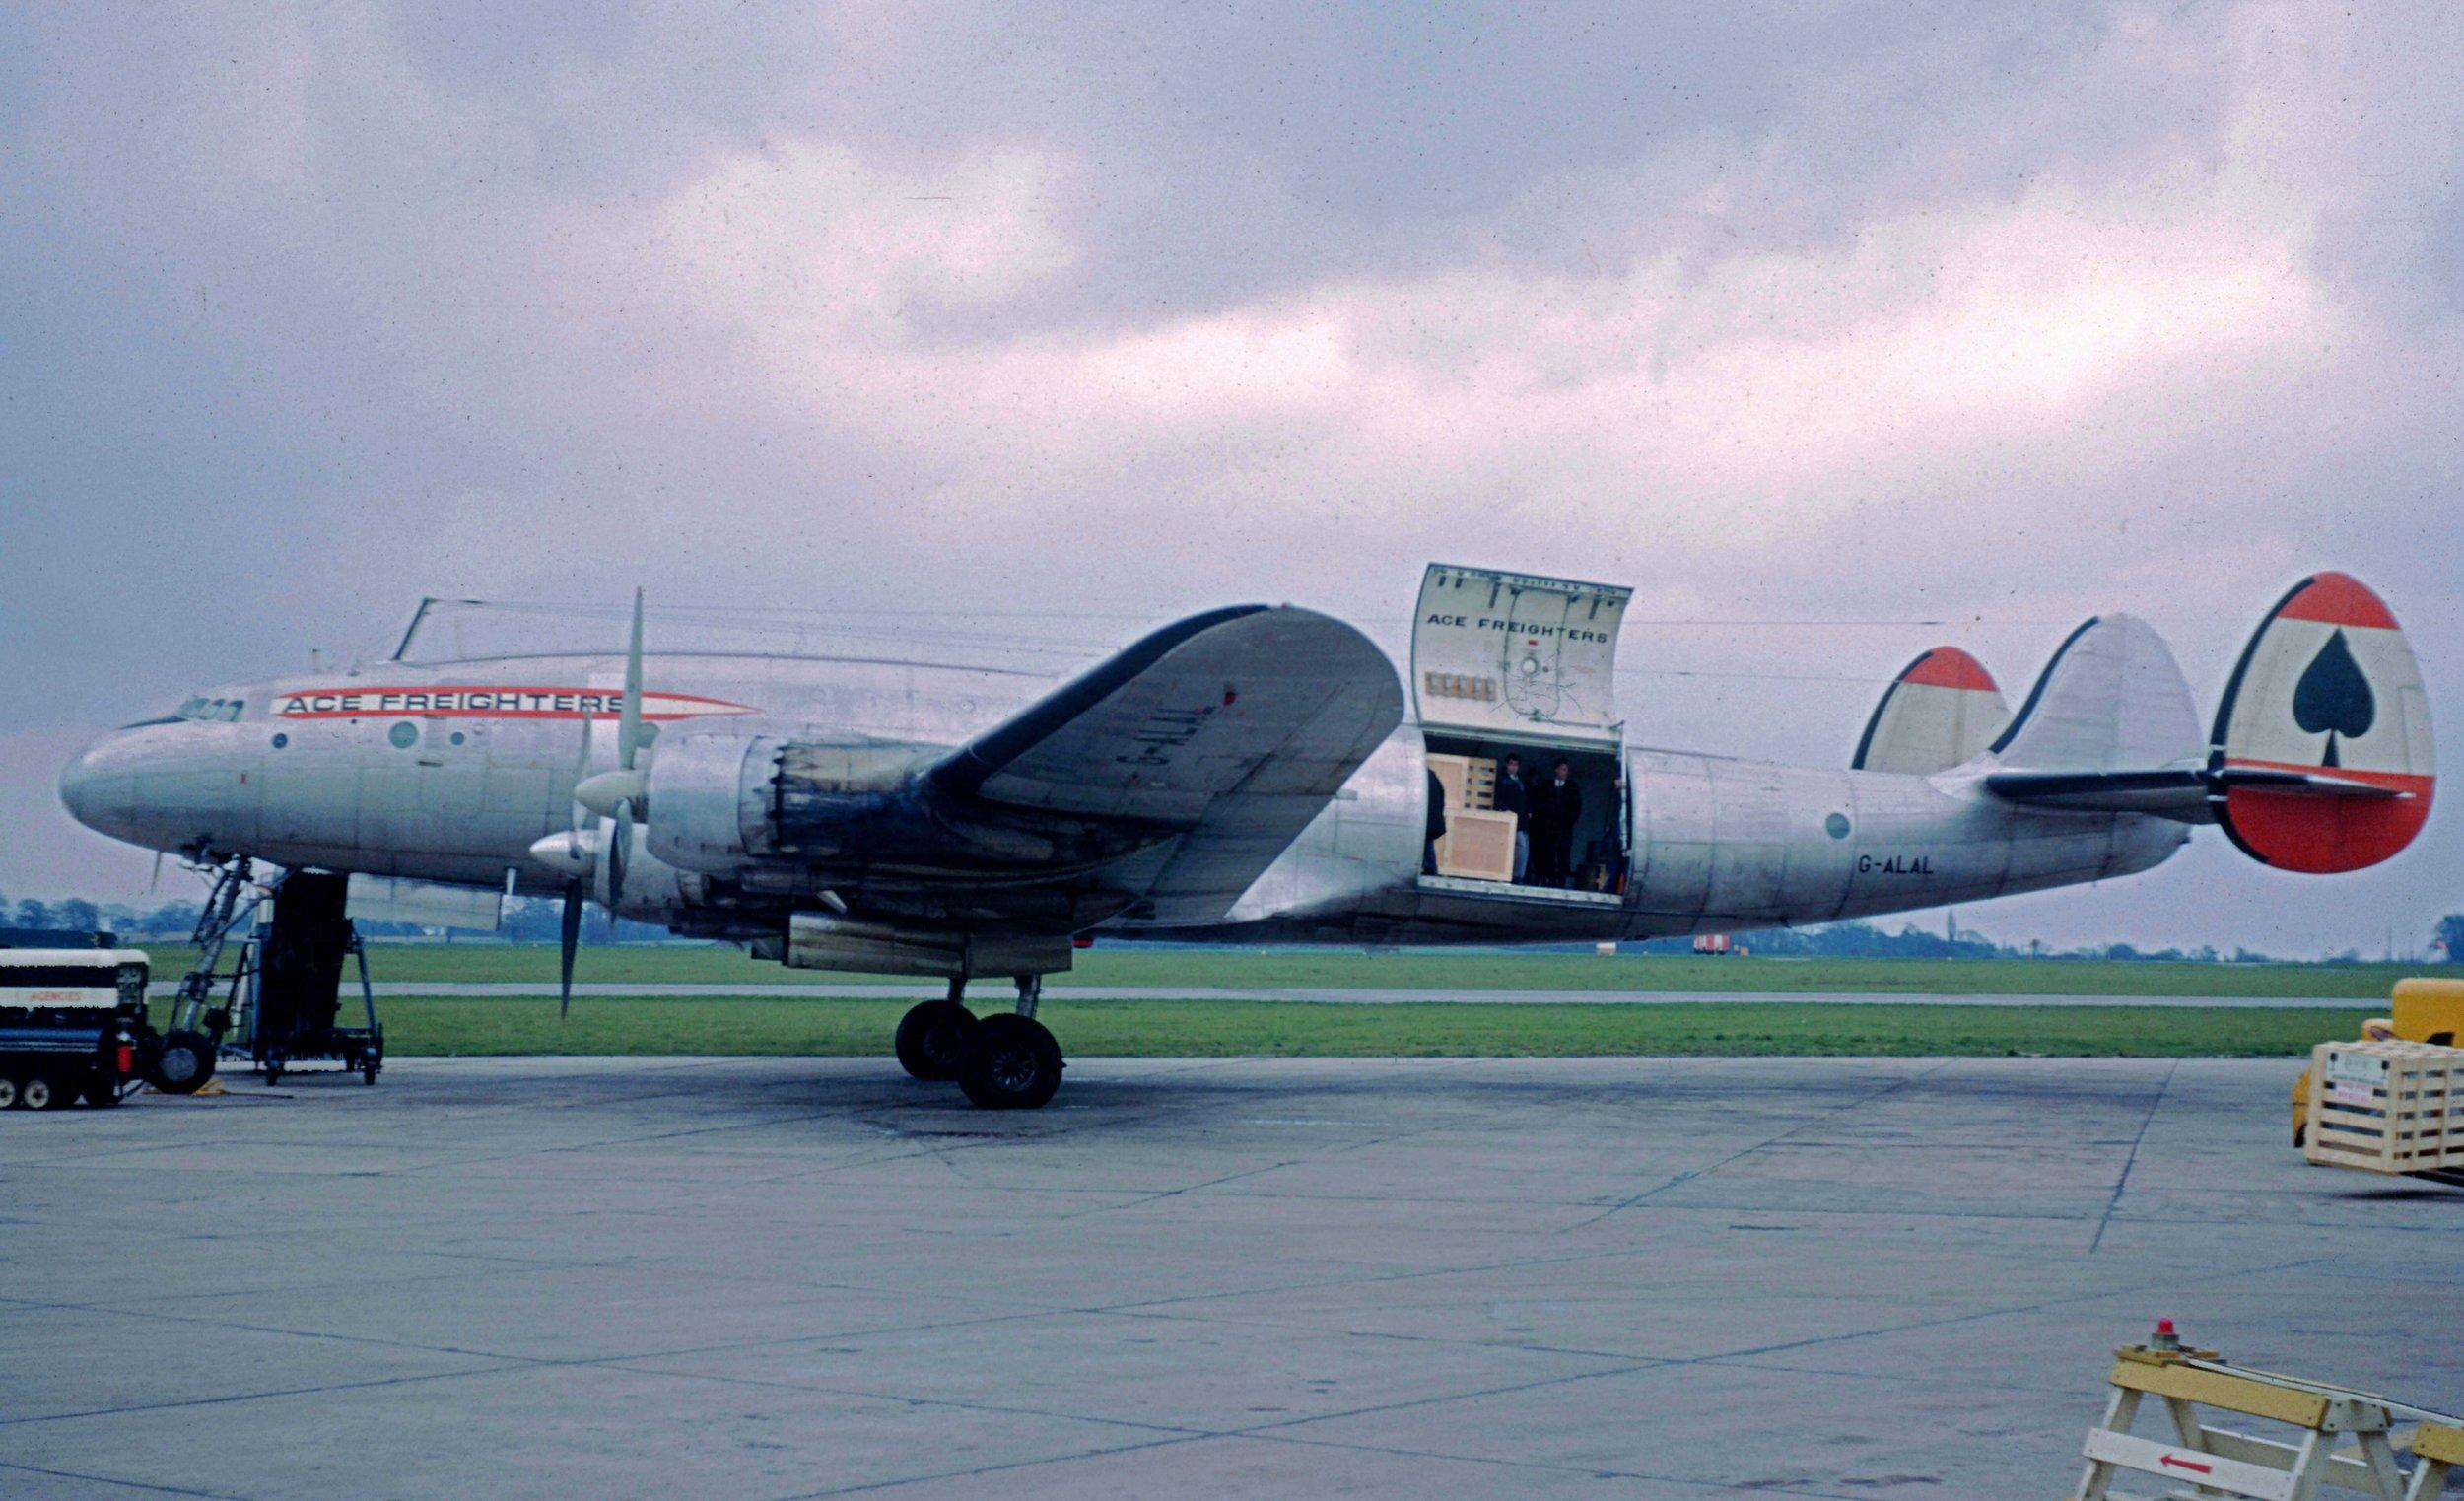 Ace Frt L749 MAN 14 APRL 66.jpg